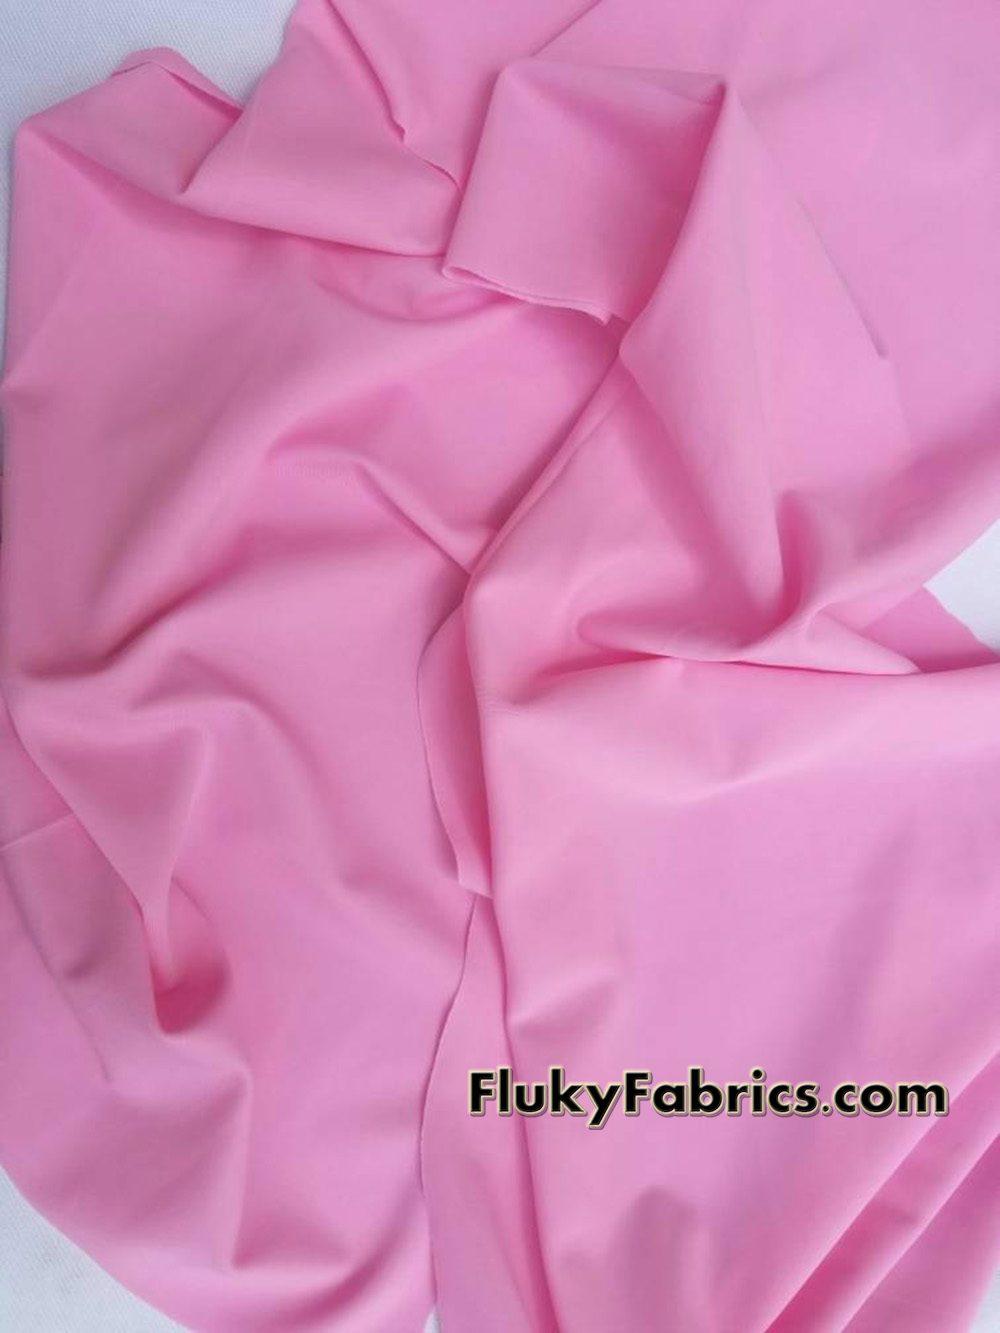 Pink Nylon Spandex Swimsuit Fabric  Fabric